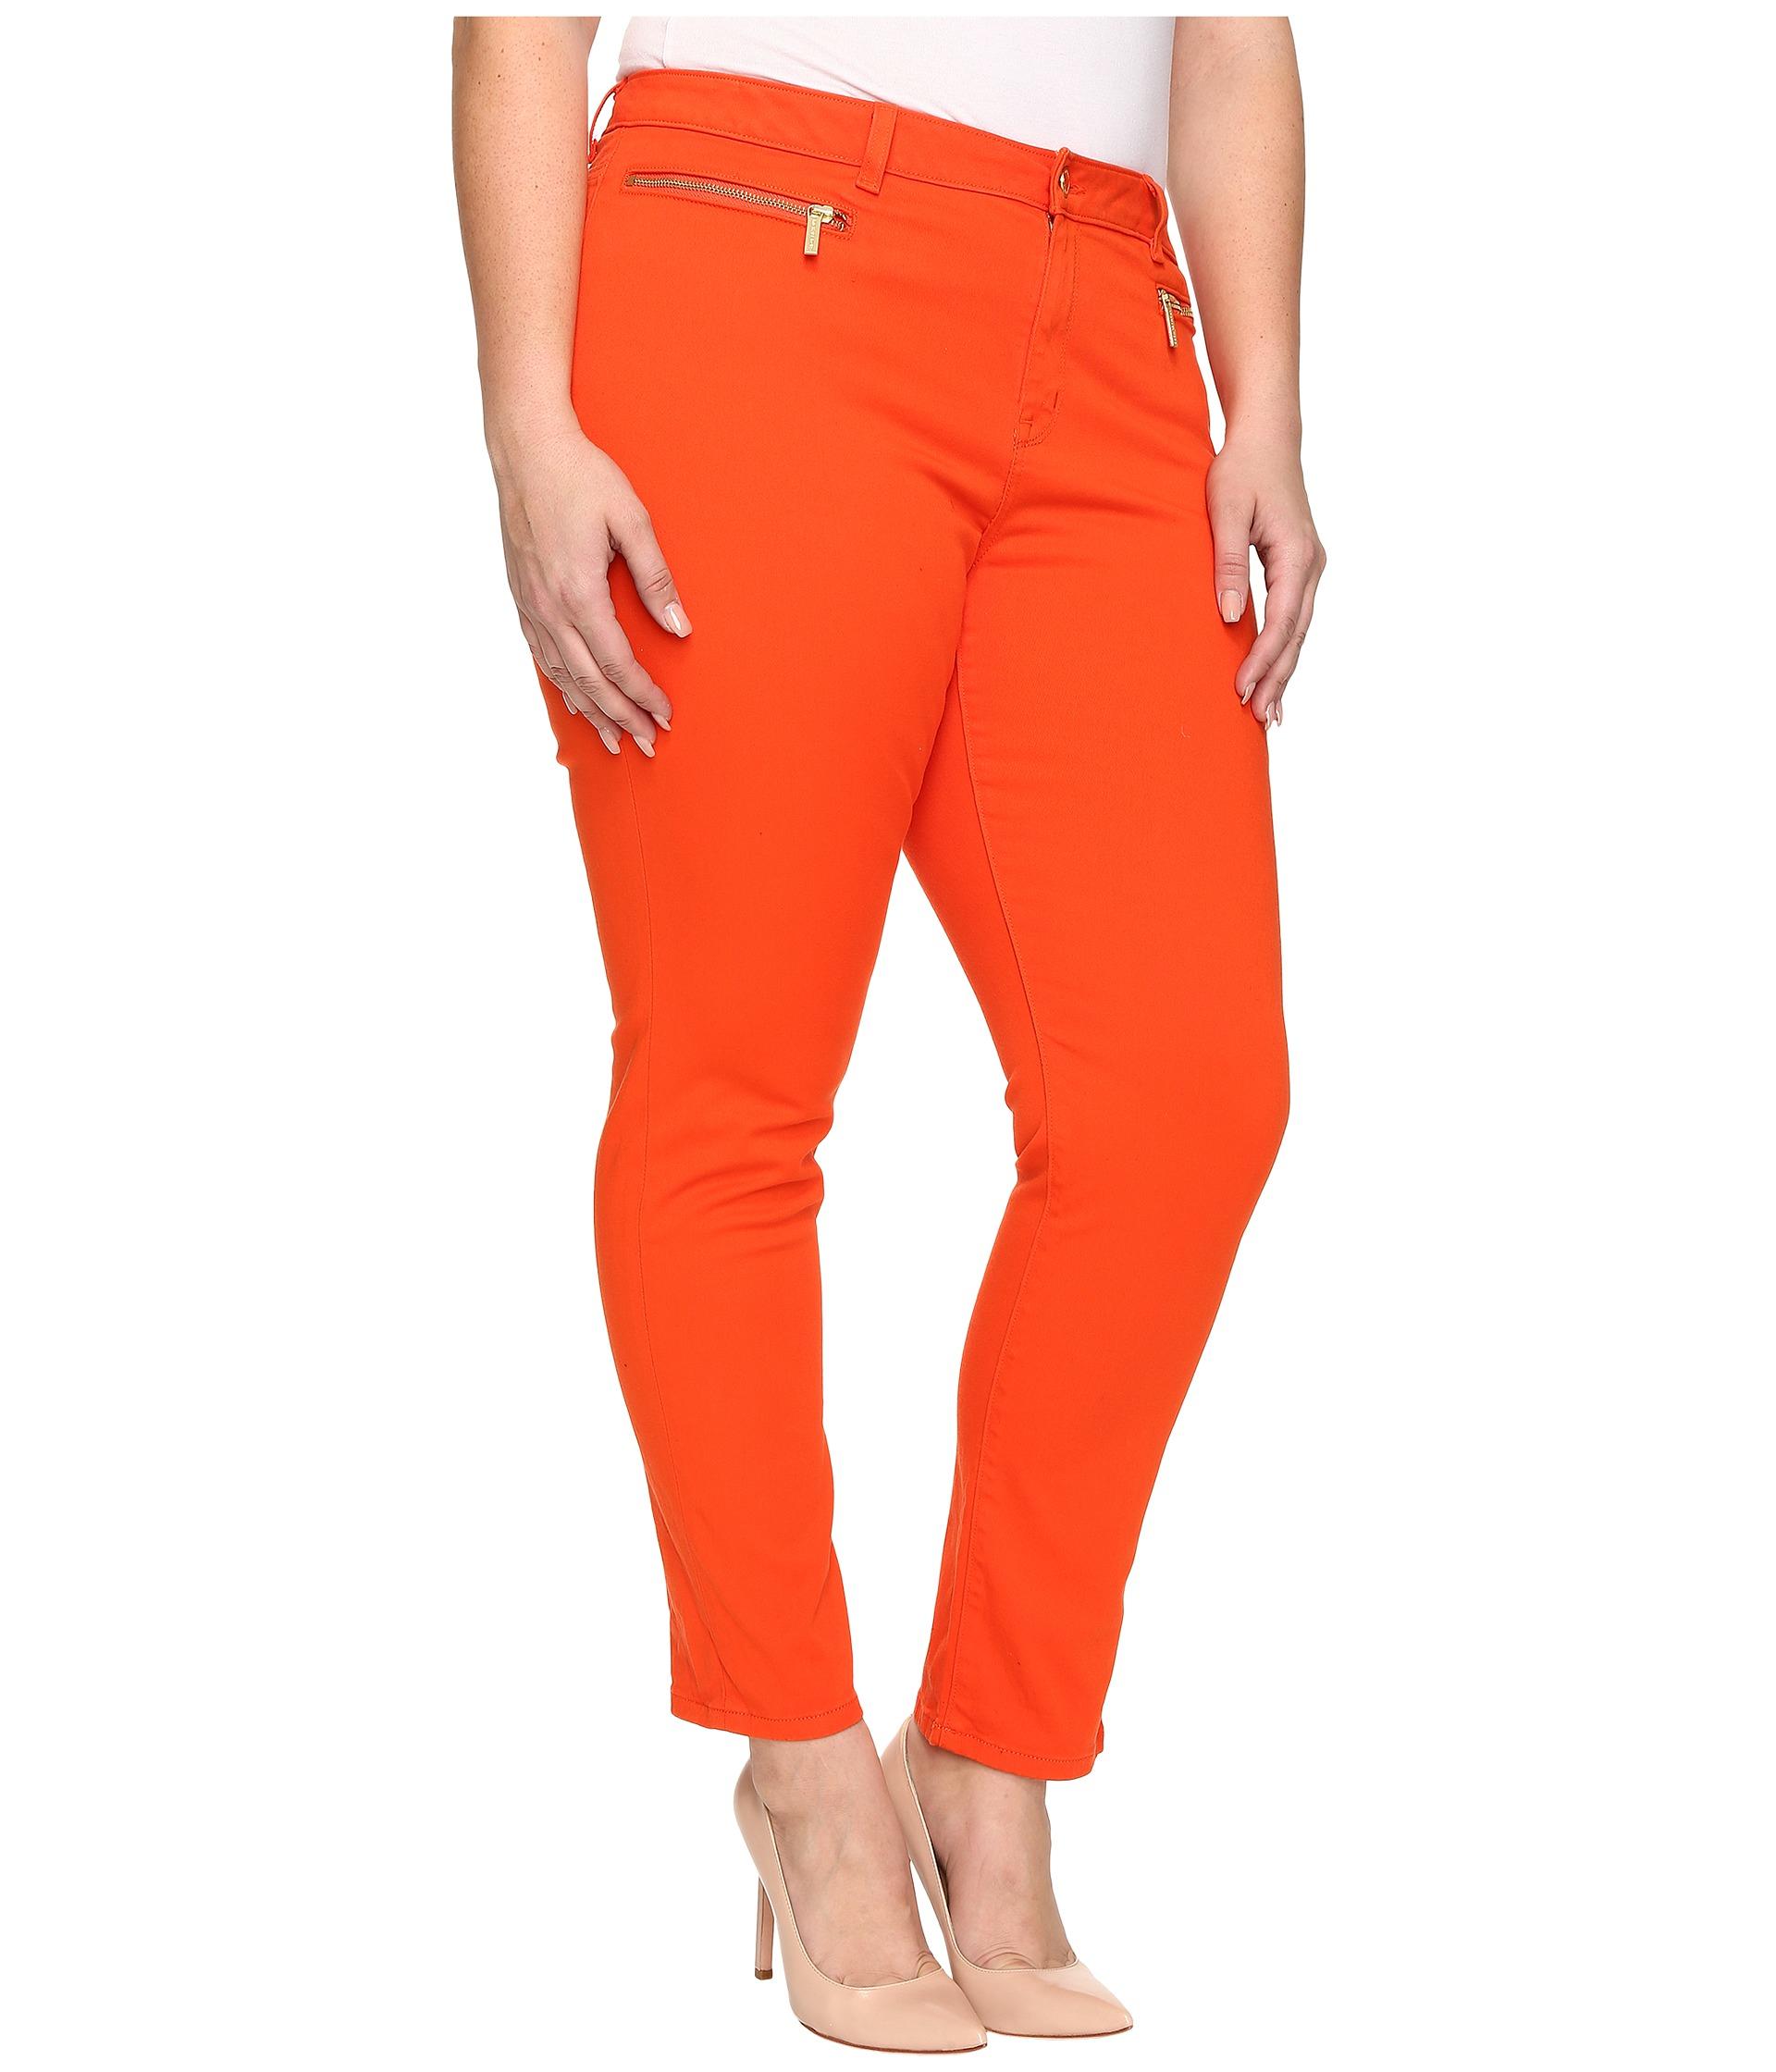 75f3d05b8a7 Lyst - MICHAEL Michael Kors Plus Size Skinny Jeans W  Zip in Orange